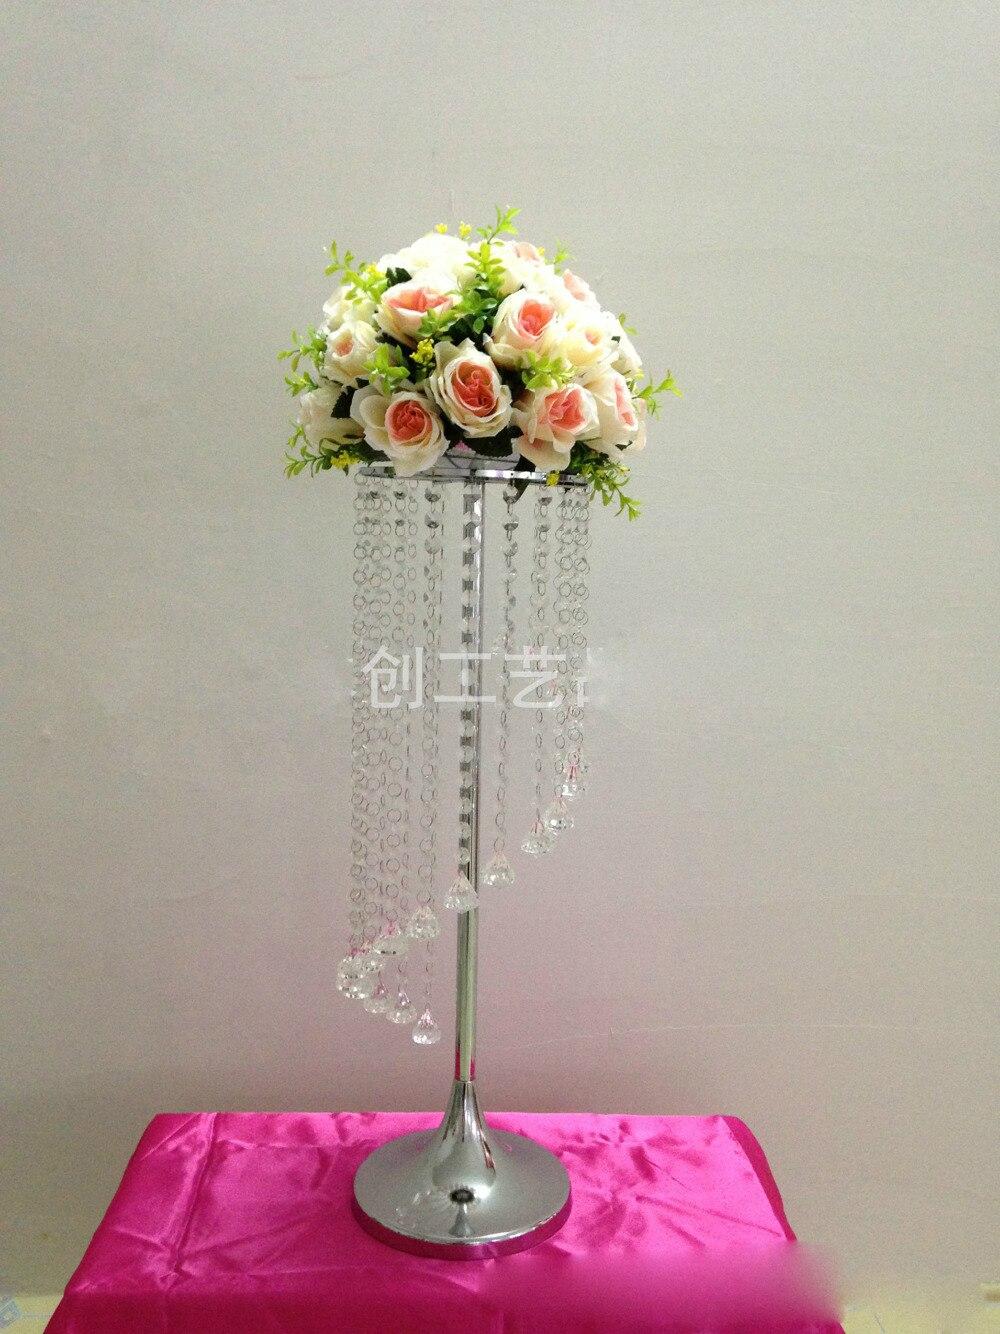 68cm Tall Hot Sale Crystal Chandelier Wedding Centerpiece